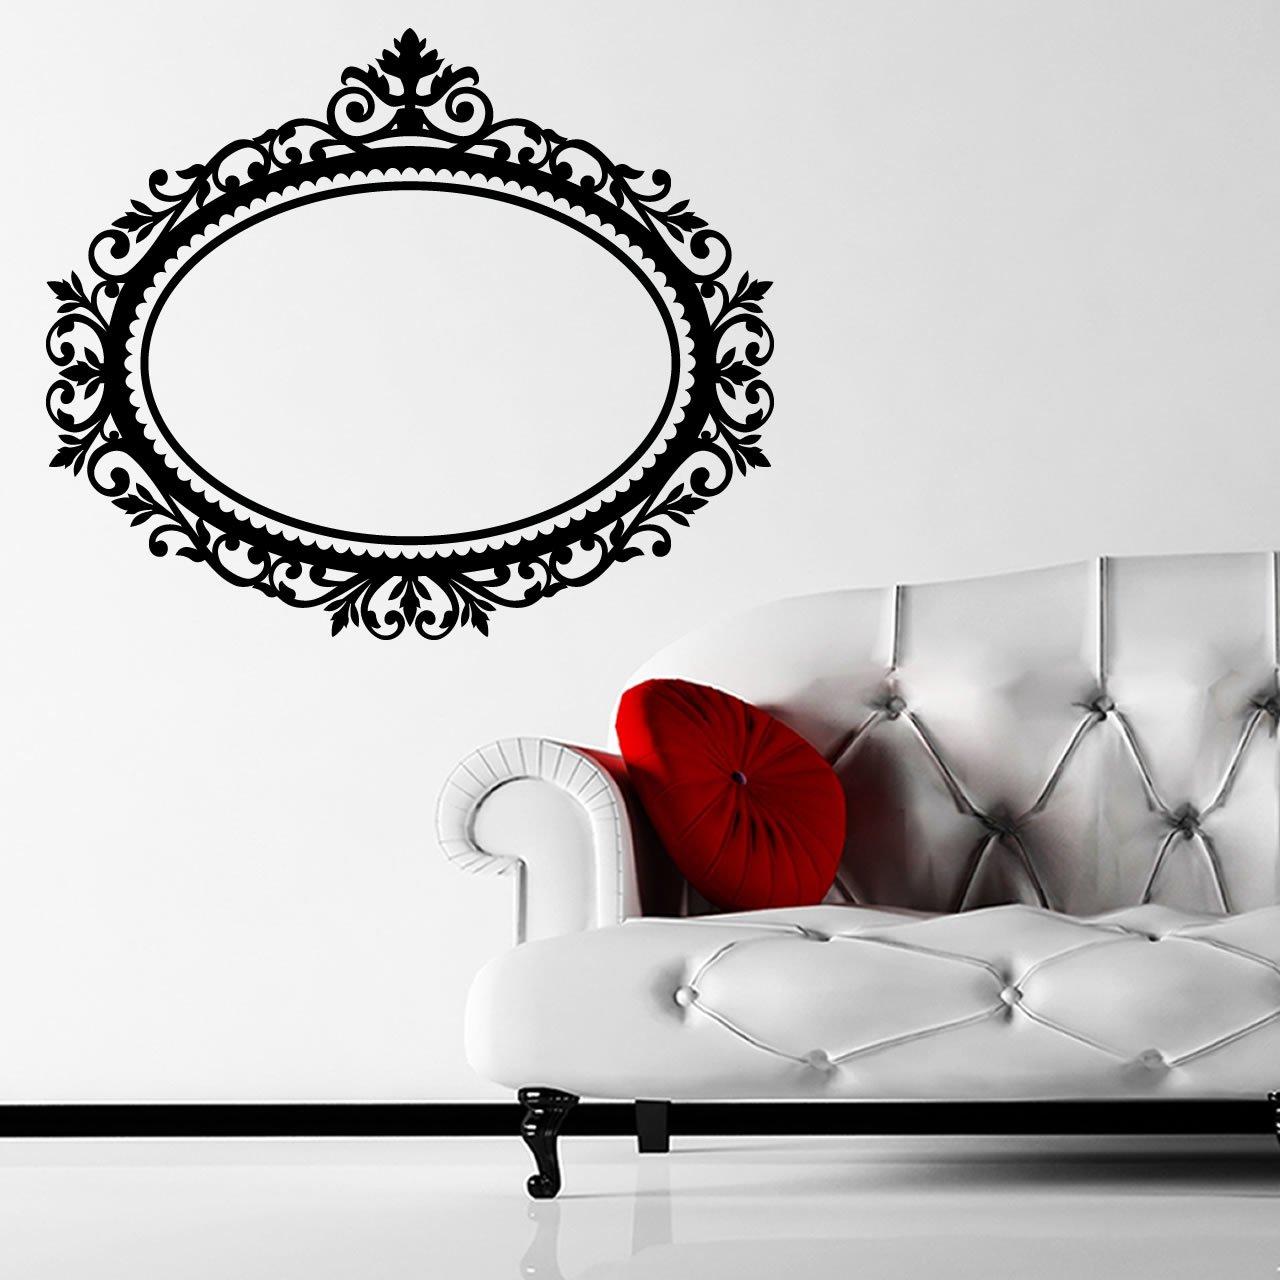 decorative frame wall sticker world of wall stickers pics photos decorative wall stickers